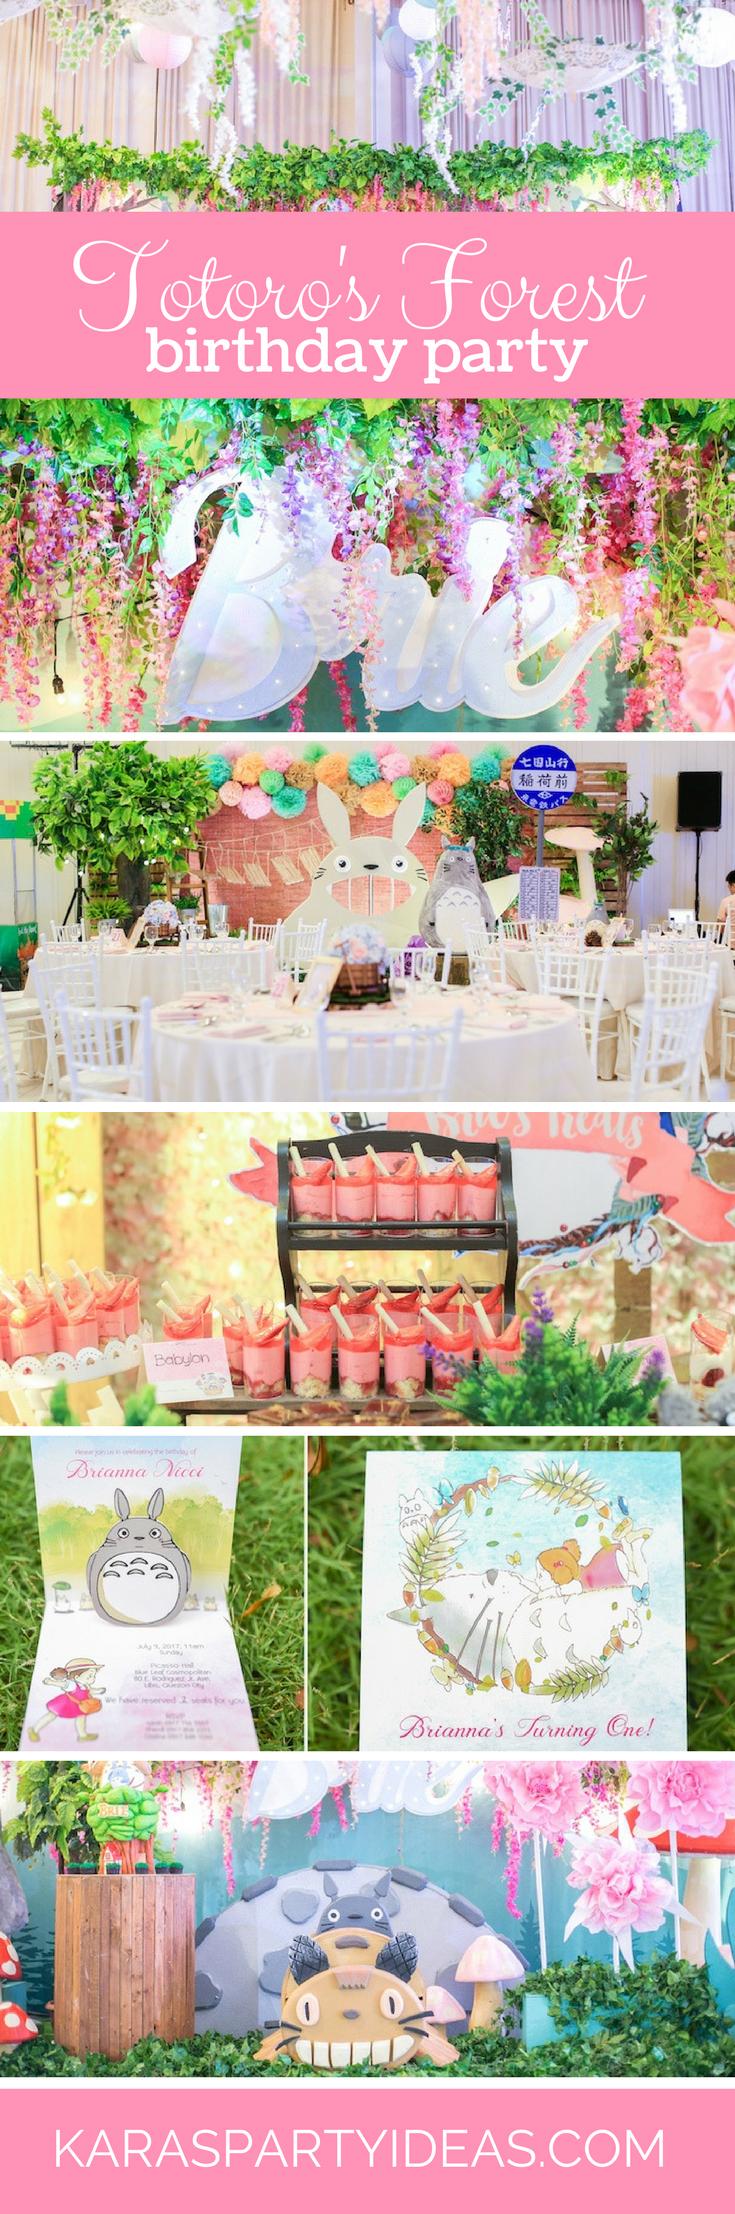 Totoro's Forest Birthday Party via Kara's Party Ideas - KarasPartyIdeas.com